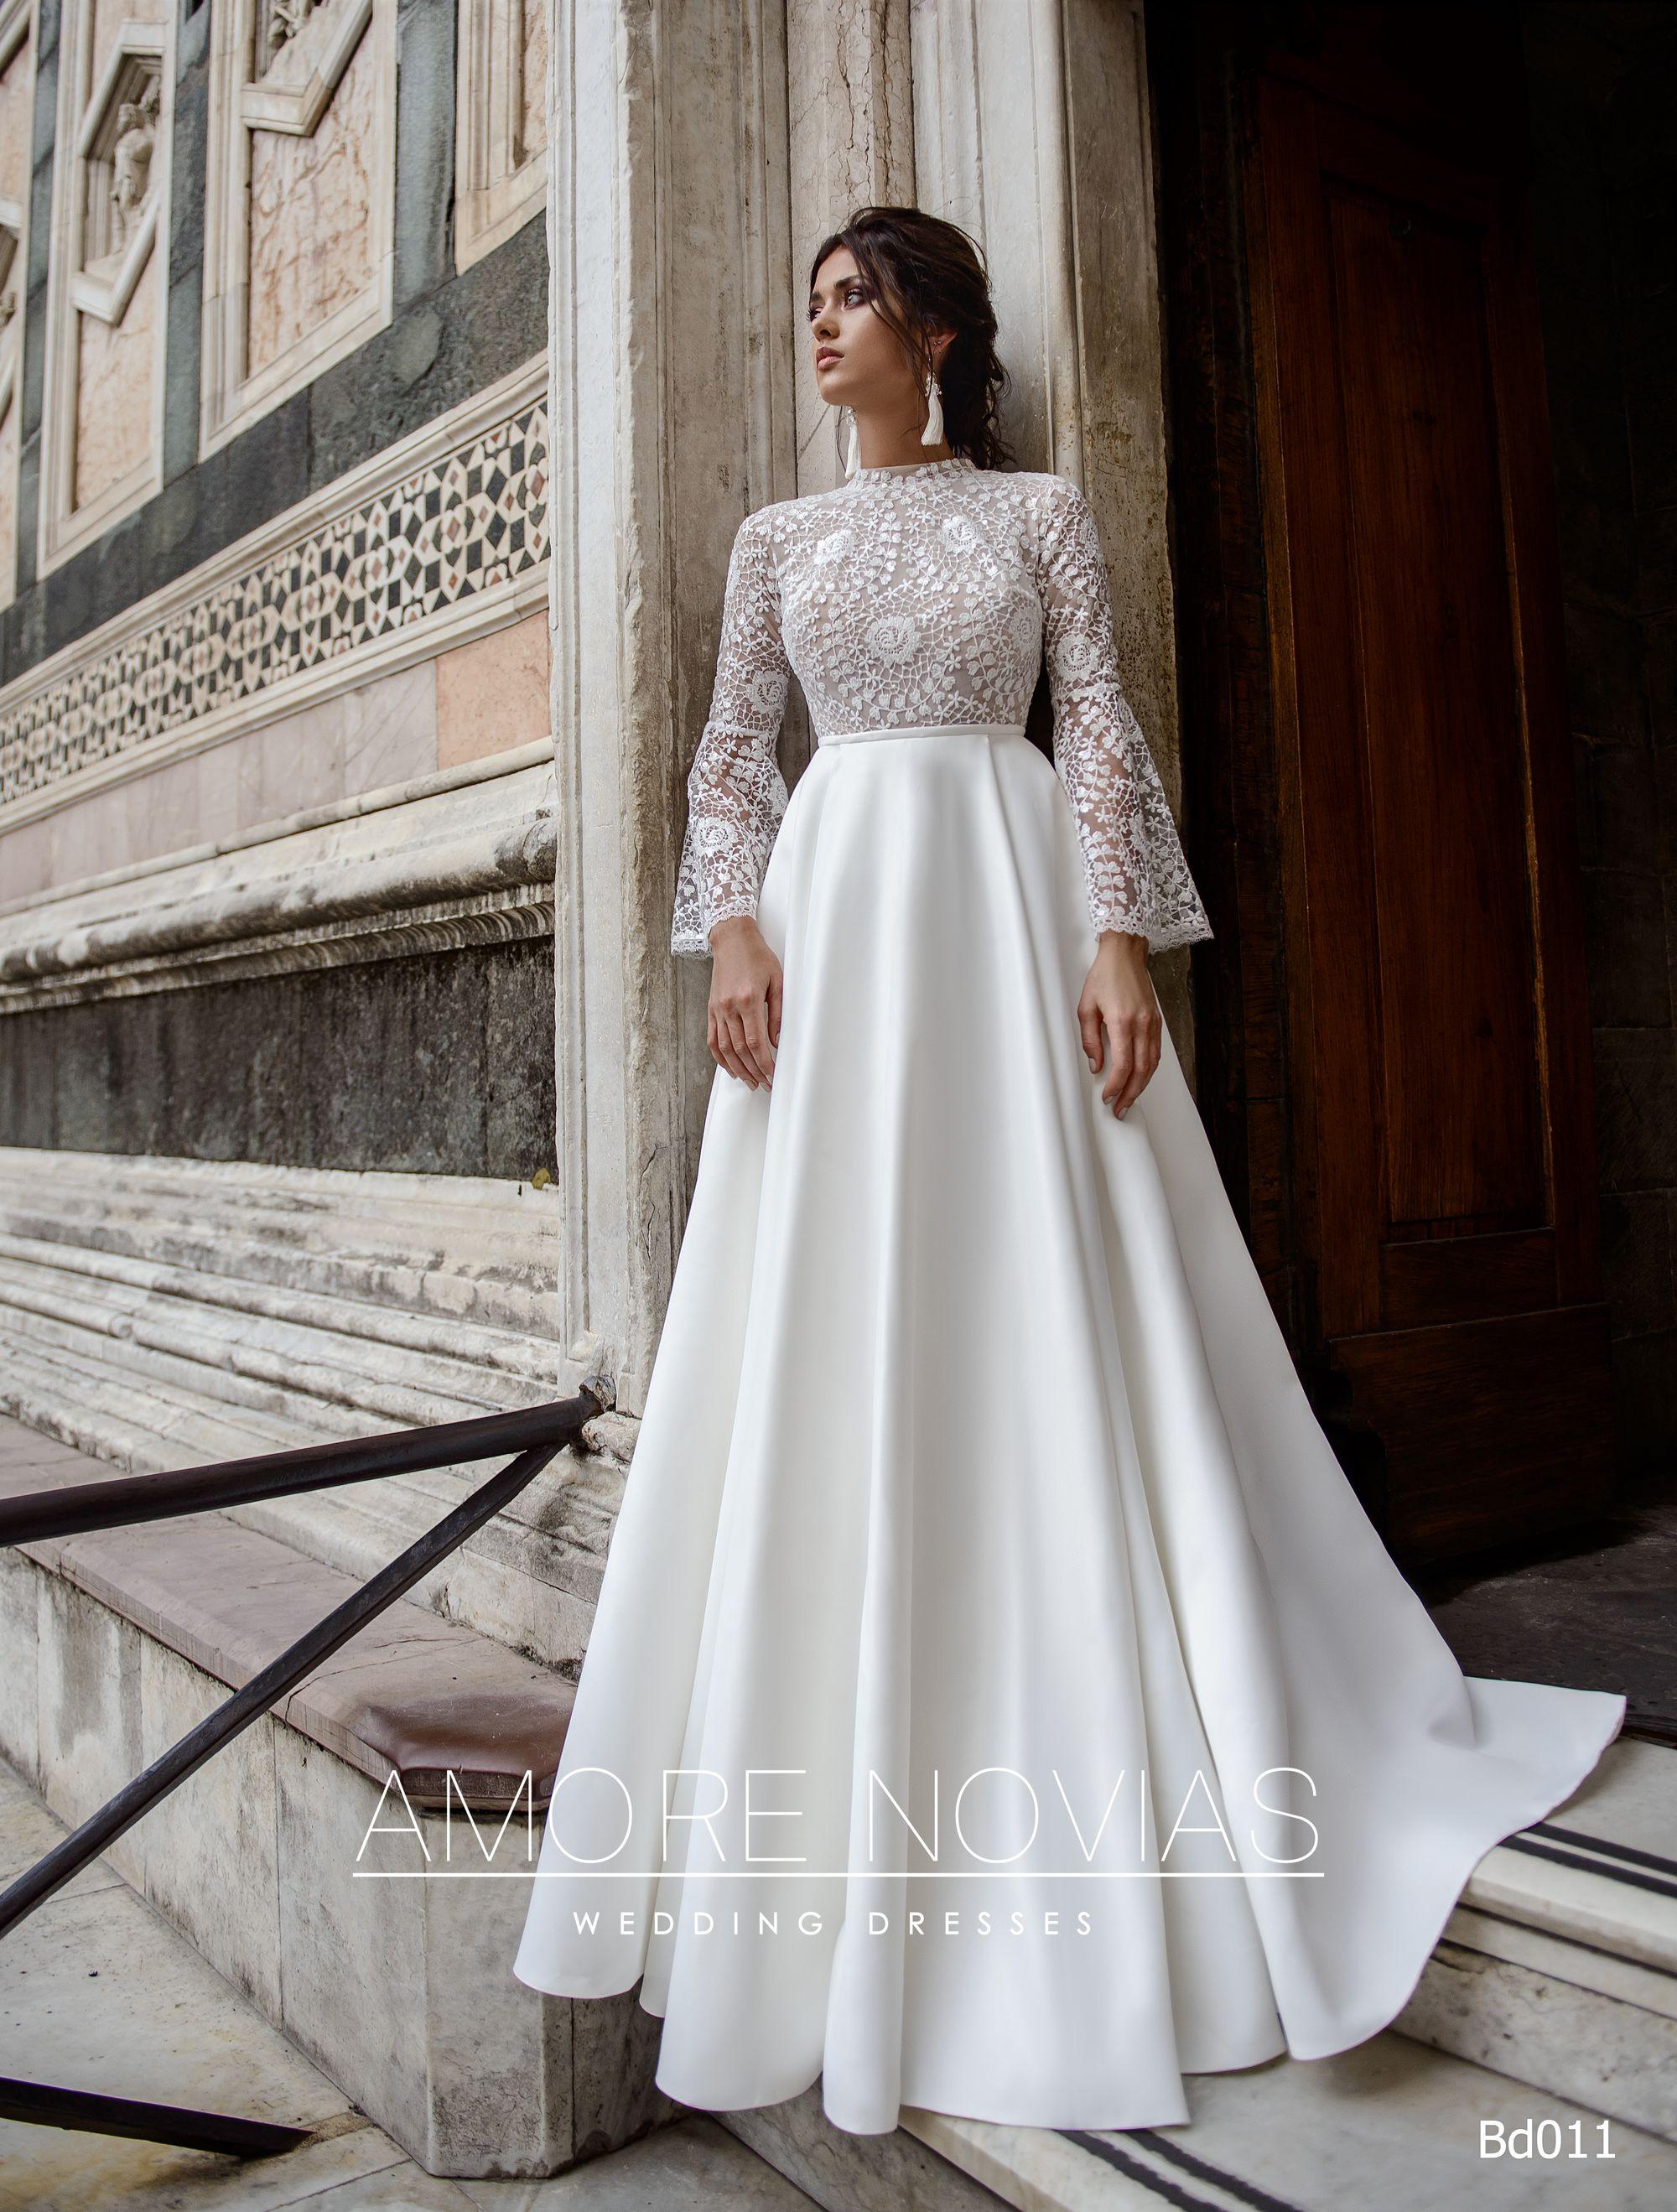 https://amore-novias.com/images/stories/virtuemart/product/bd011-------(1).jpg